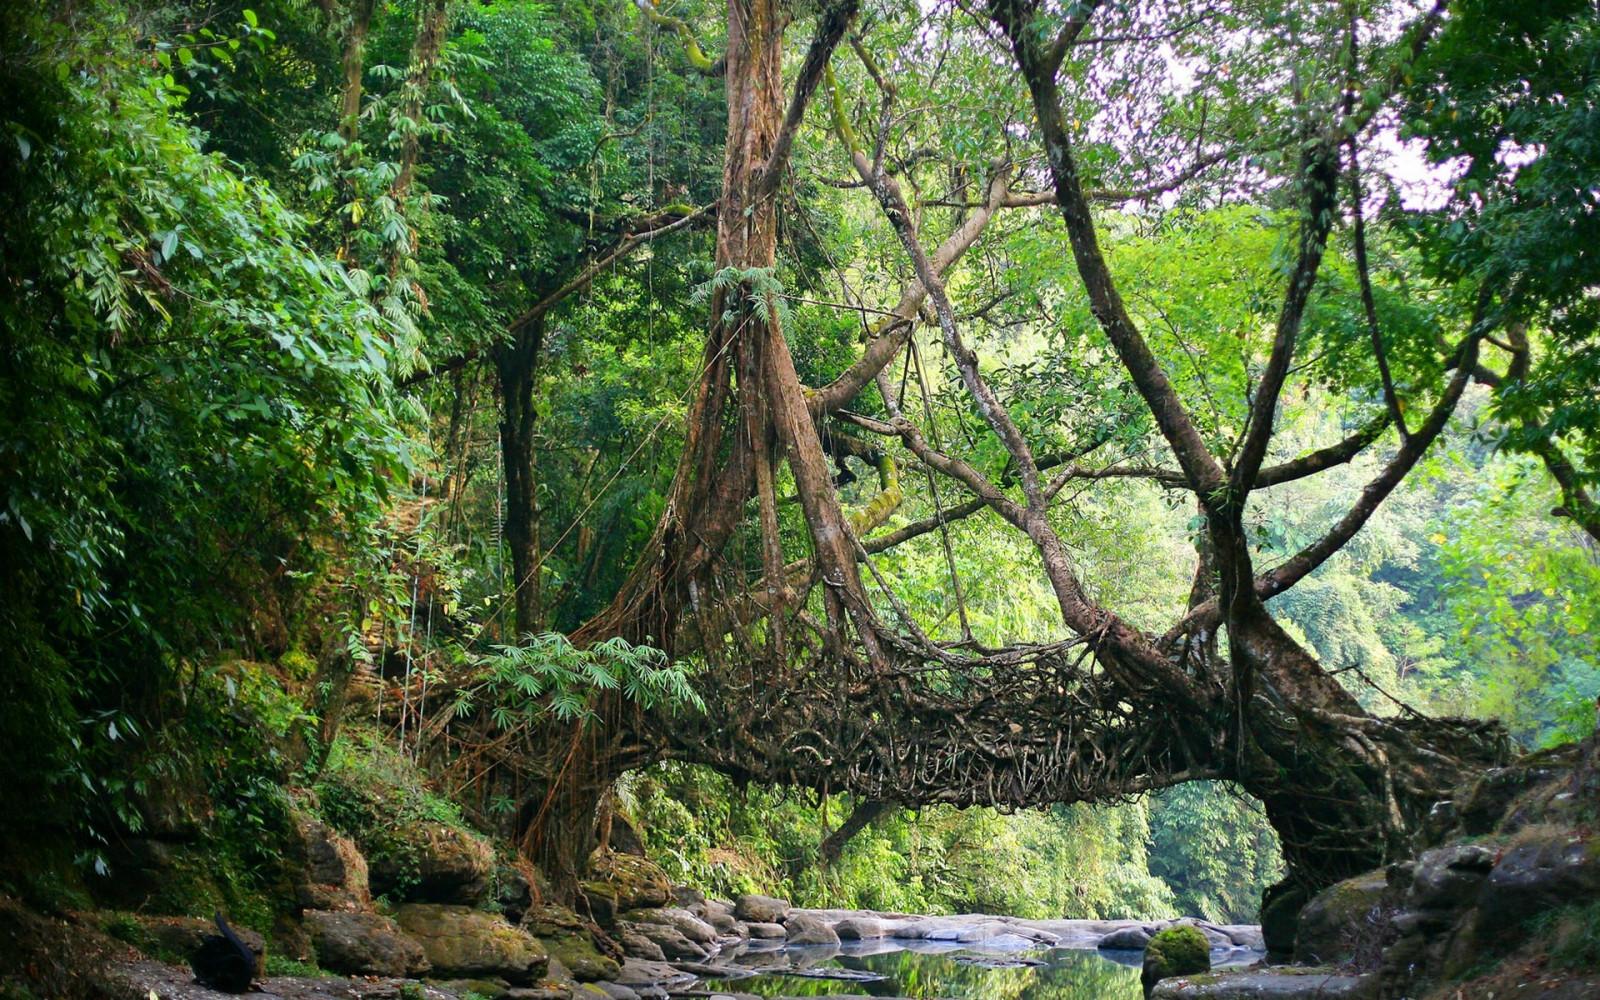 fond d 39 cran des arbres la nature branche vert pont rivi re r gion sauvage jungle. Black Bedroom Furniture Sets. Home Design Ideas